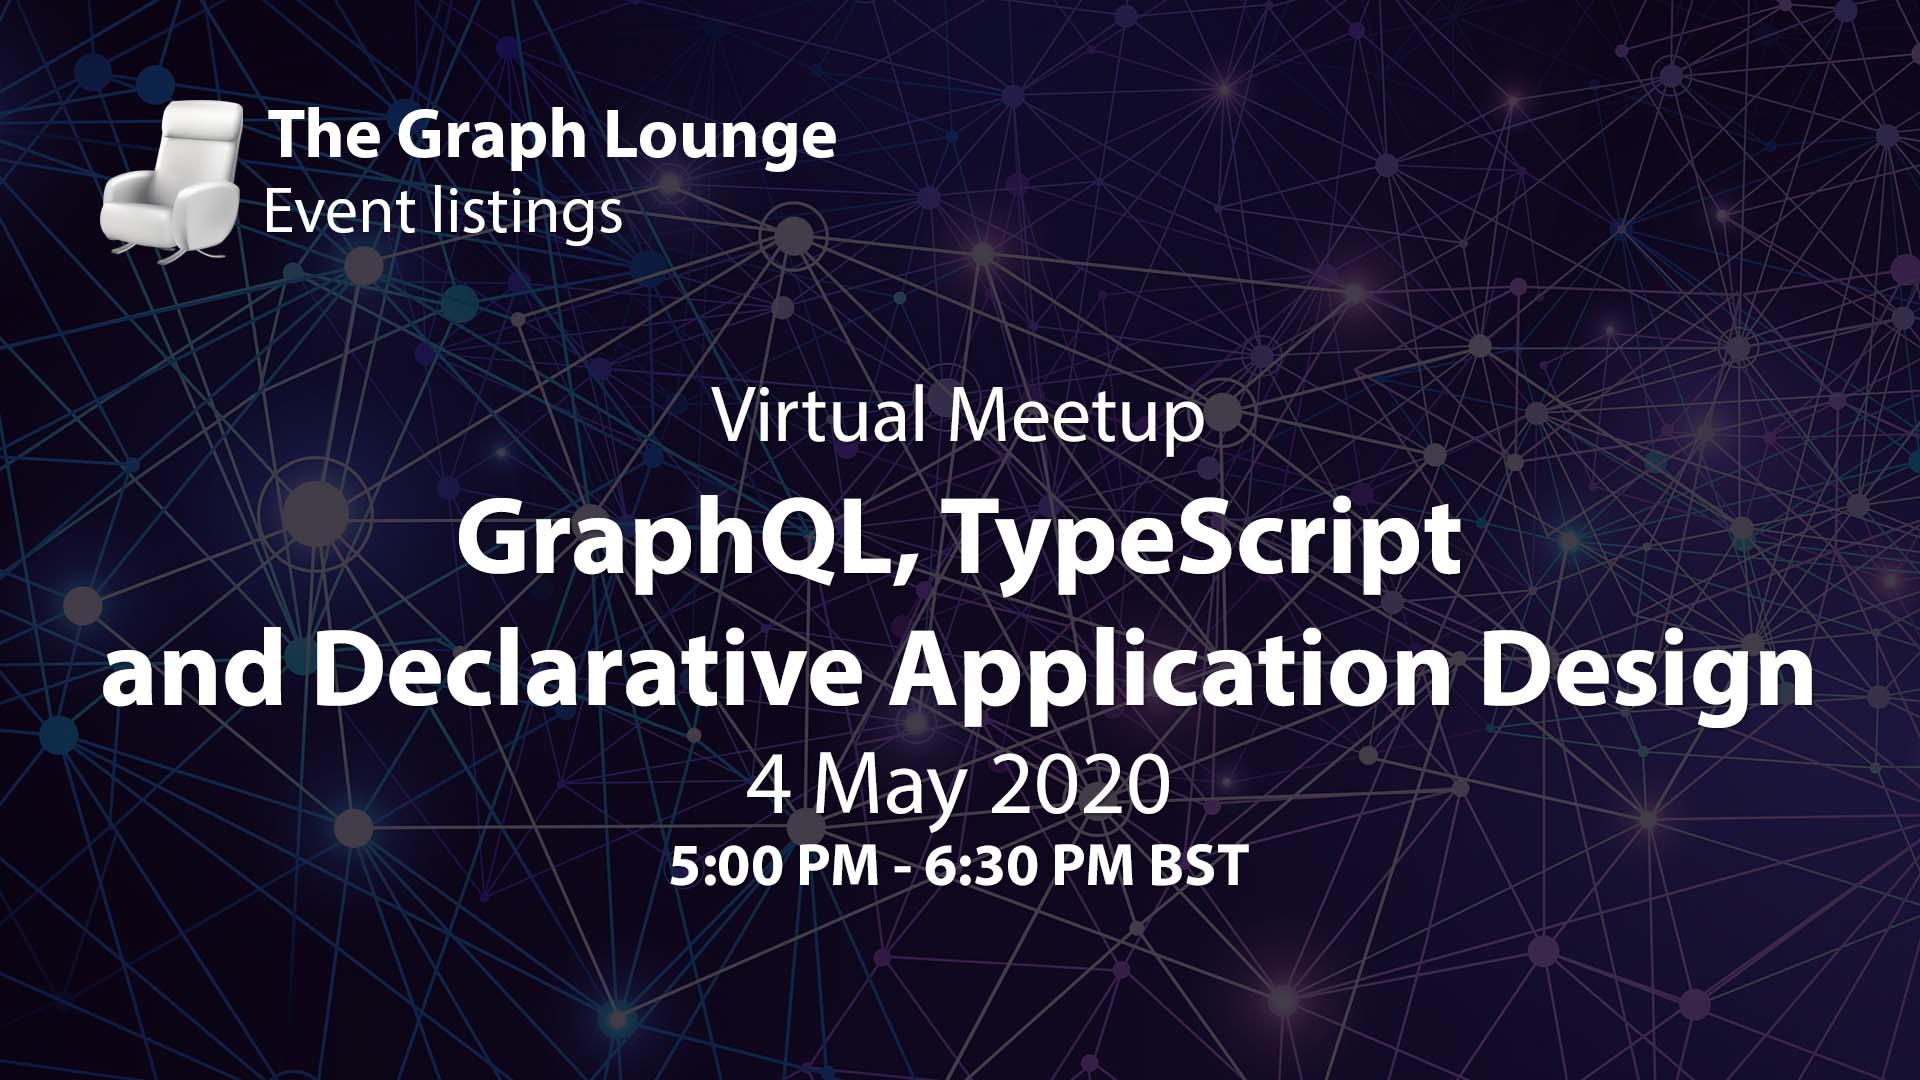 GraphQL, TypeScript and Declarative Application Design